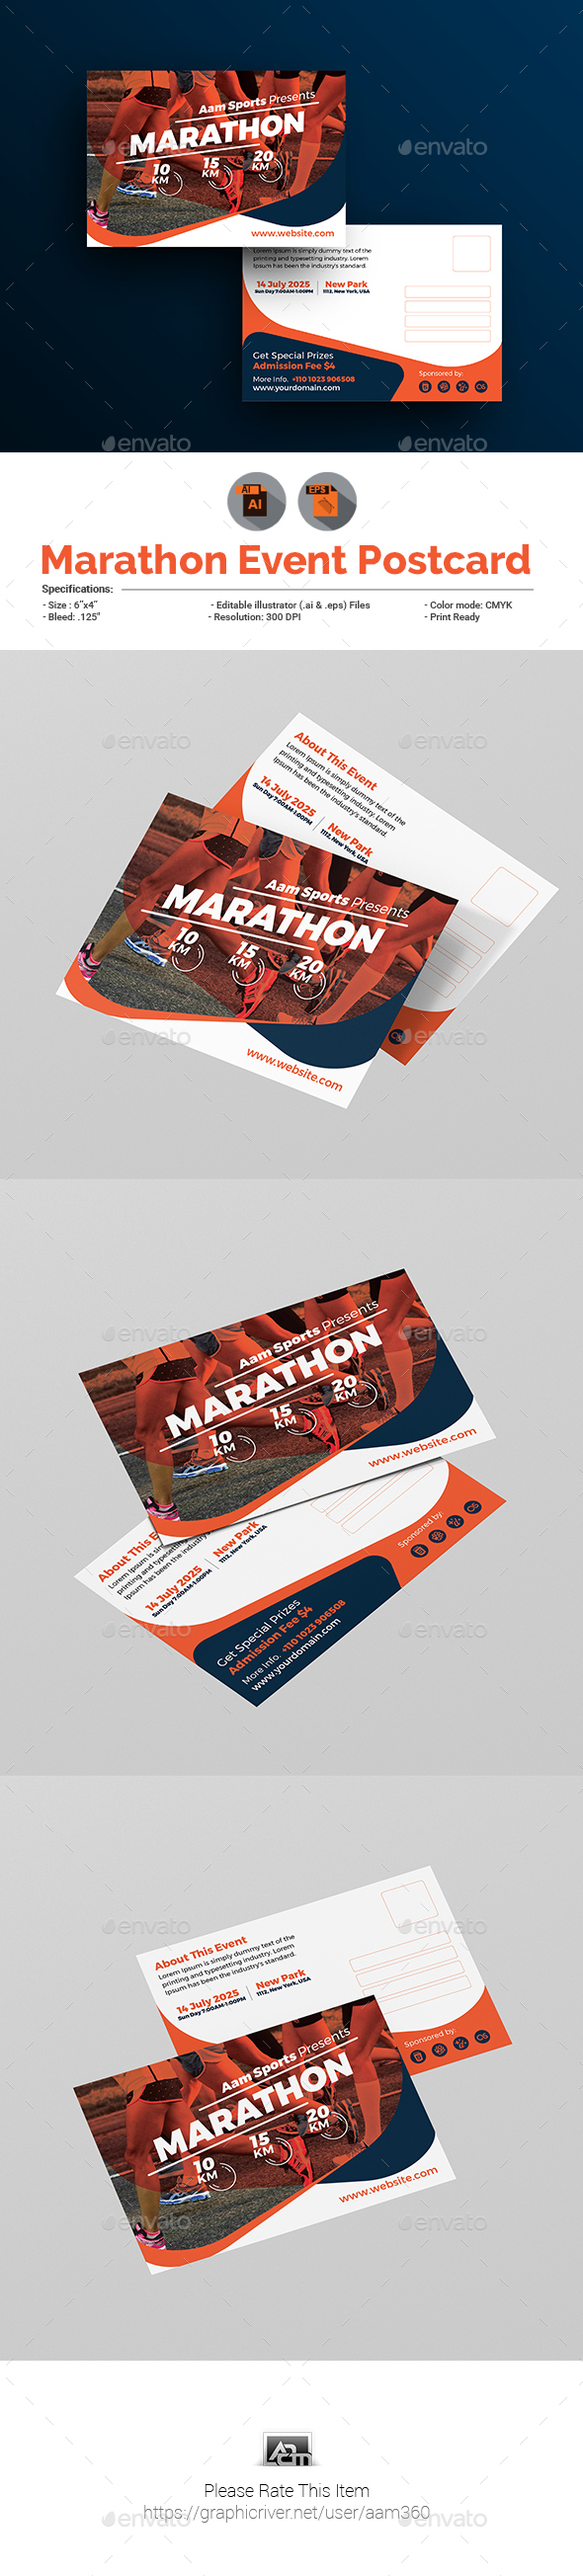 Marathon Event Postcard Template - Cards & Invites Print Templates